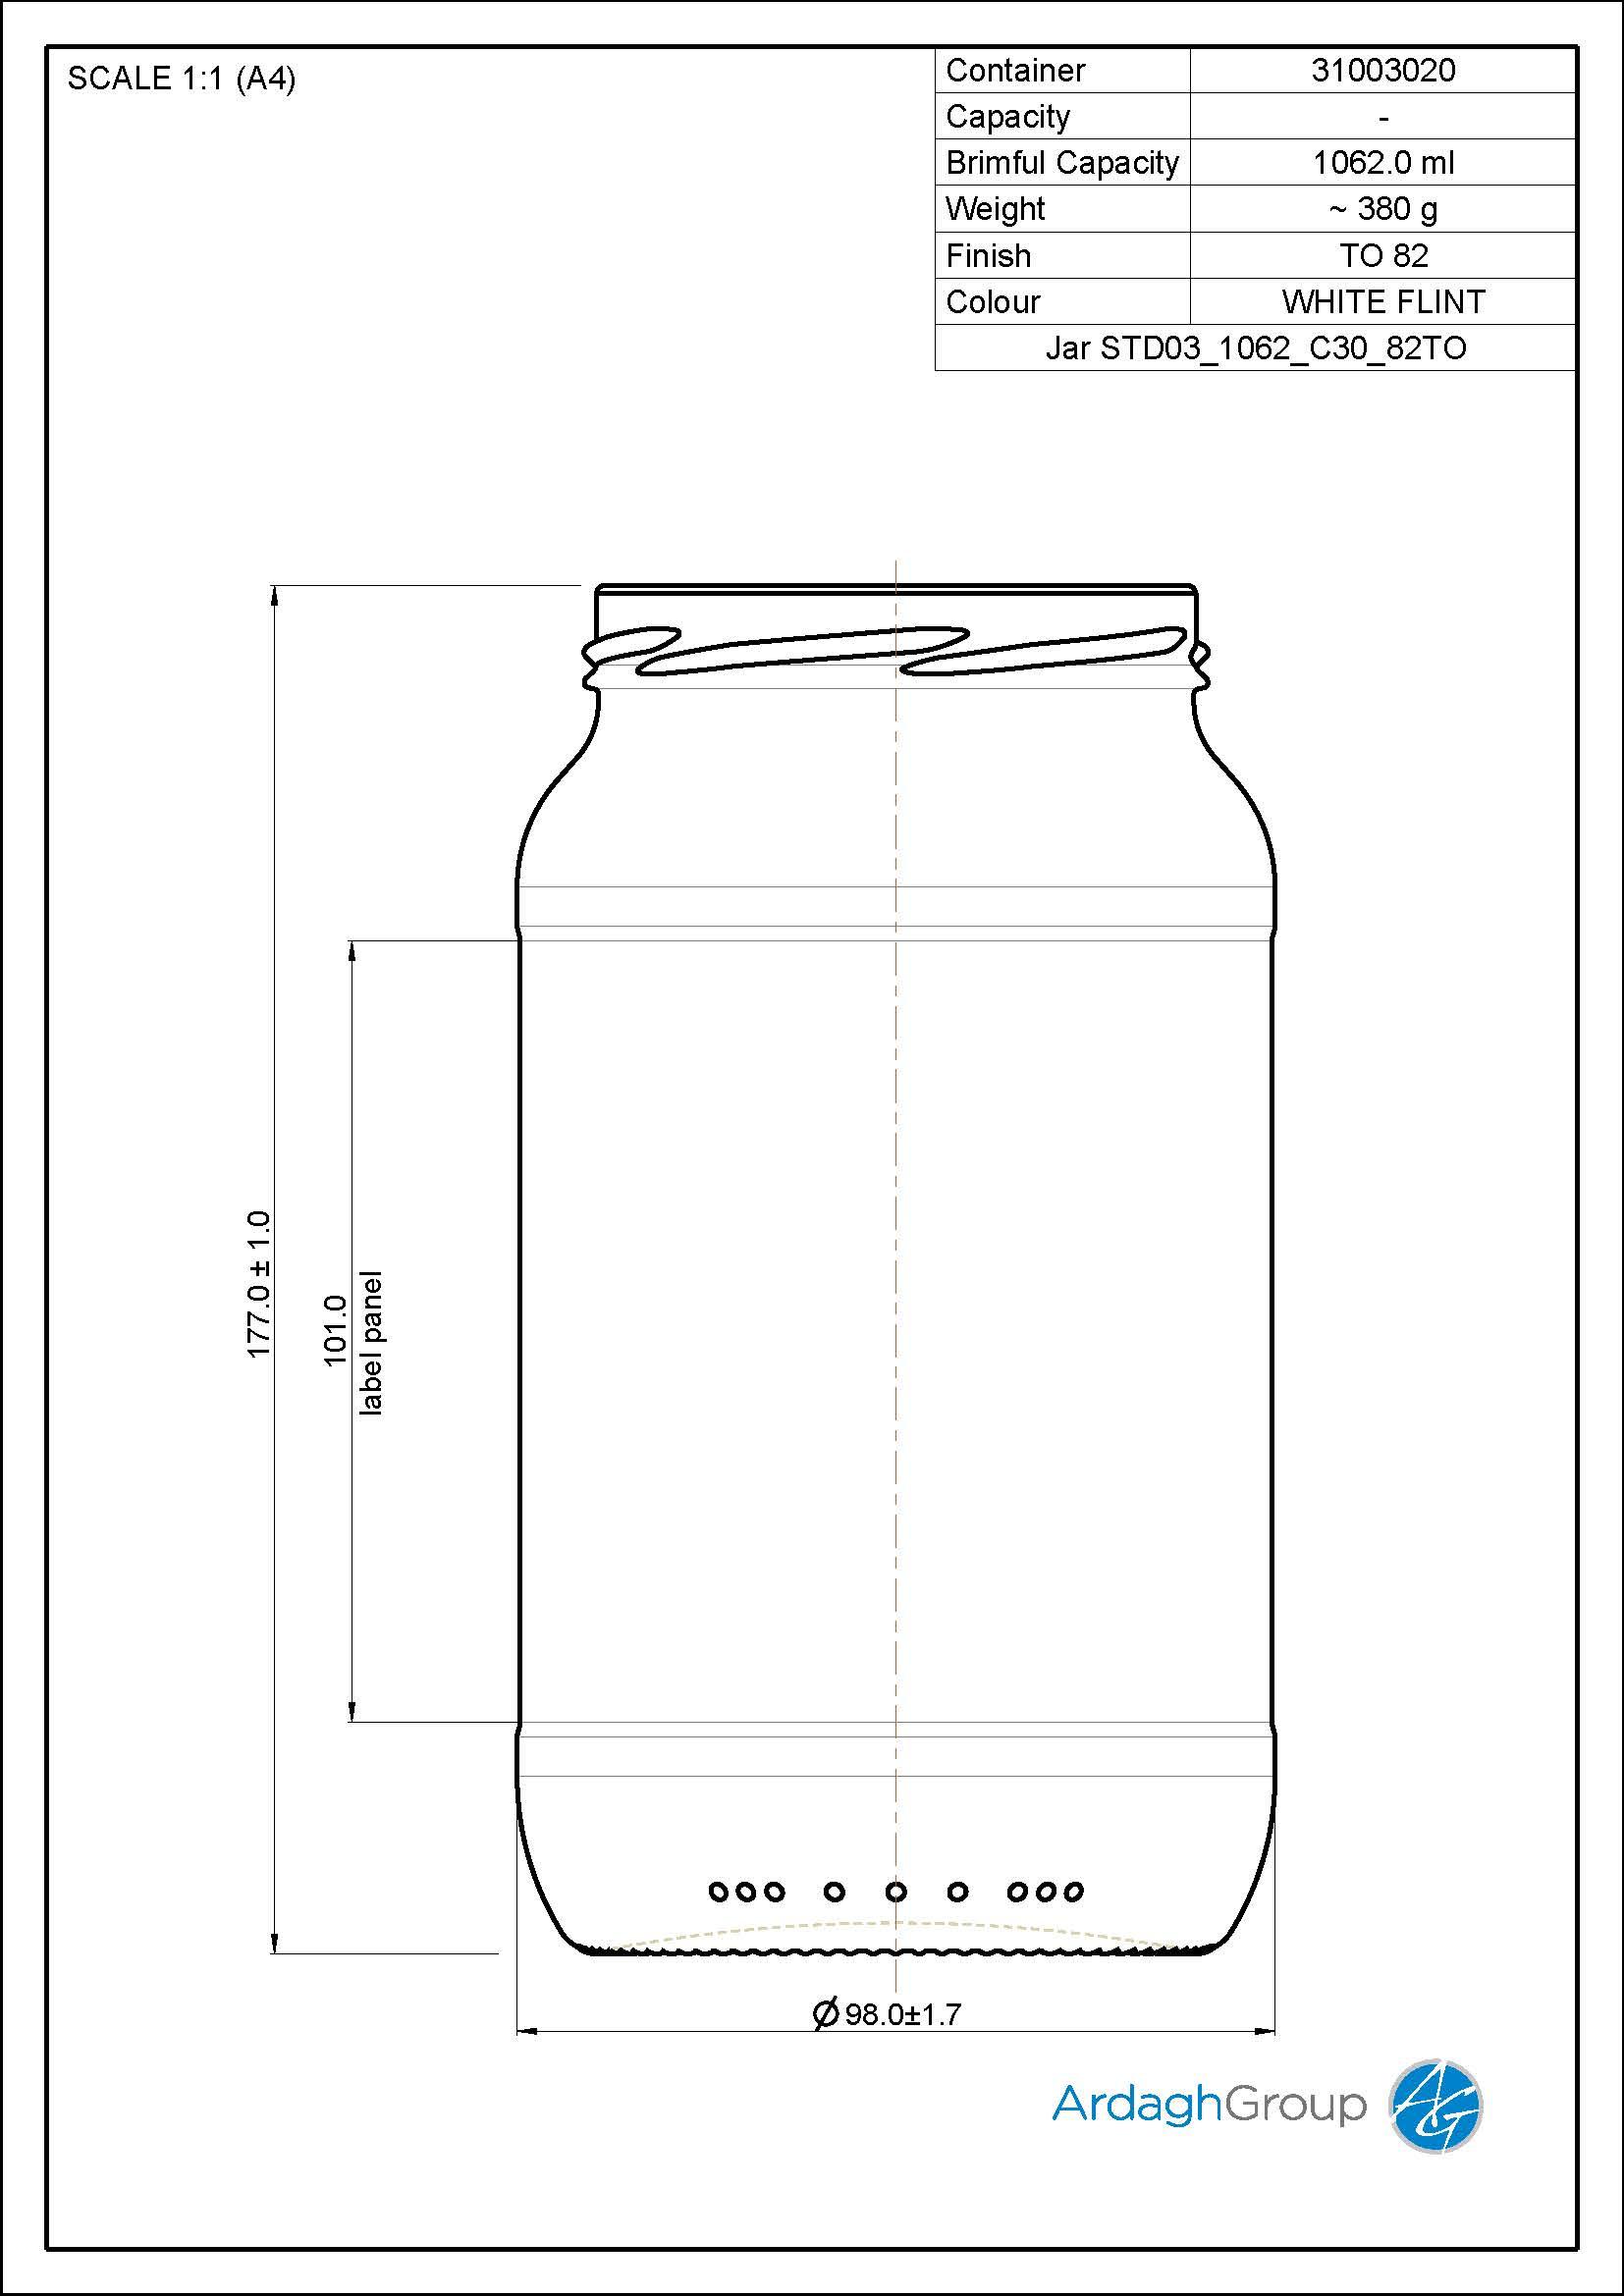 Jar STD03 1062 C30 82TO